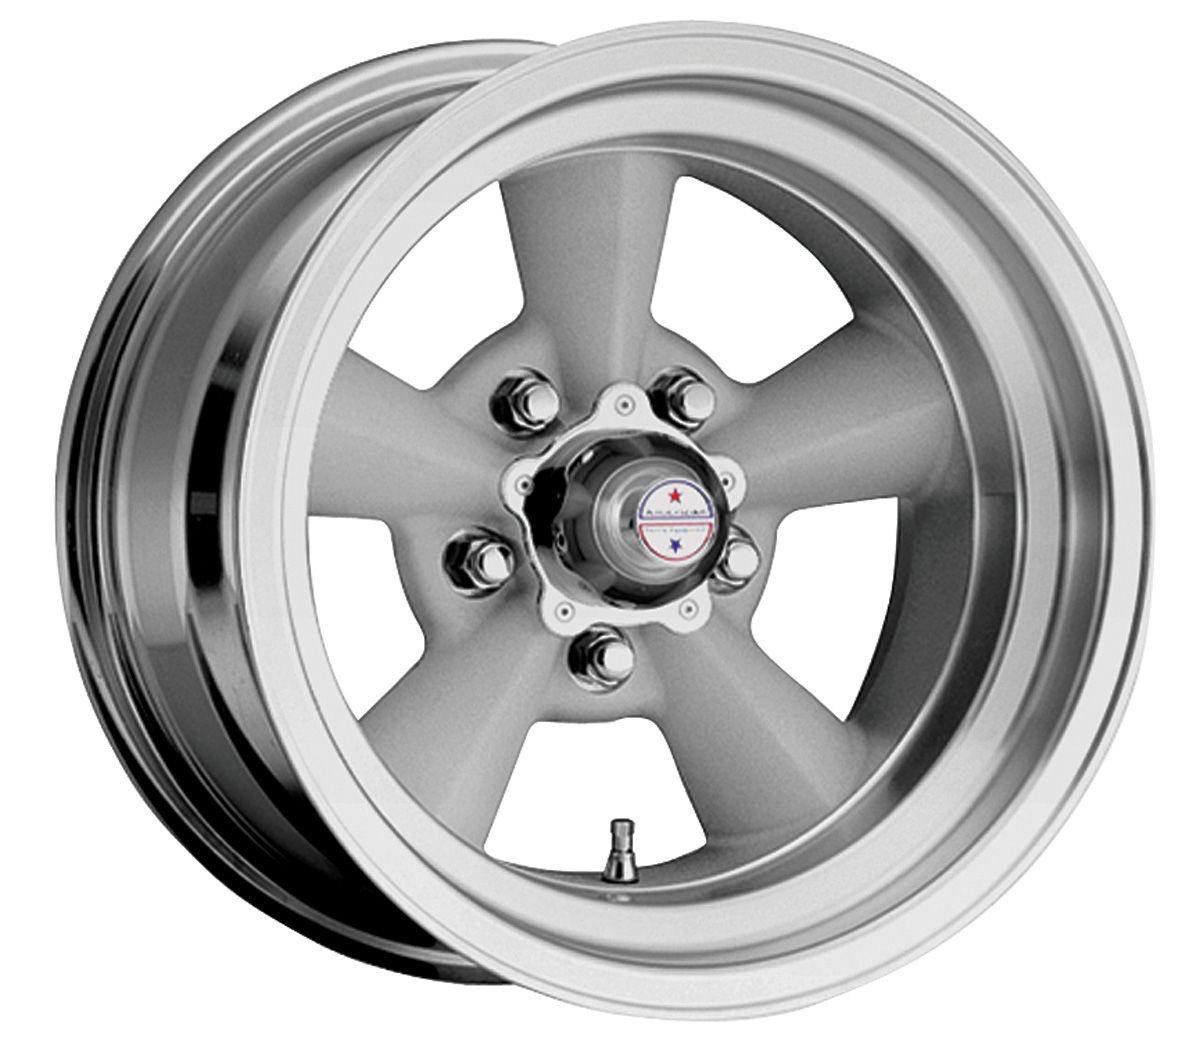 American Racing Cutlass 442 Wheel Torq Thrust Original 15